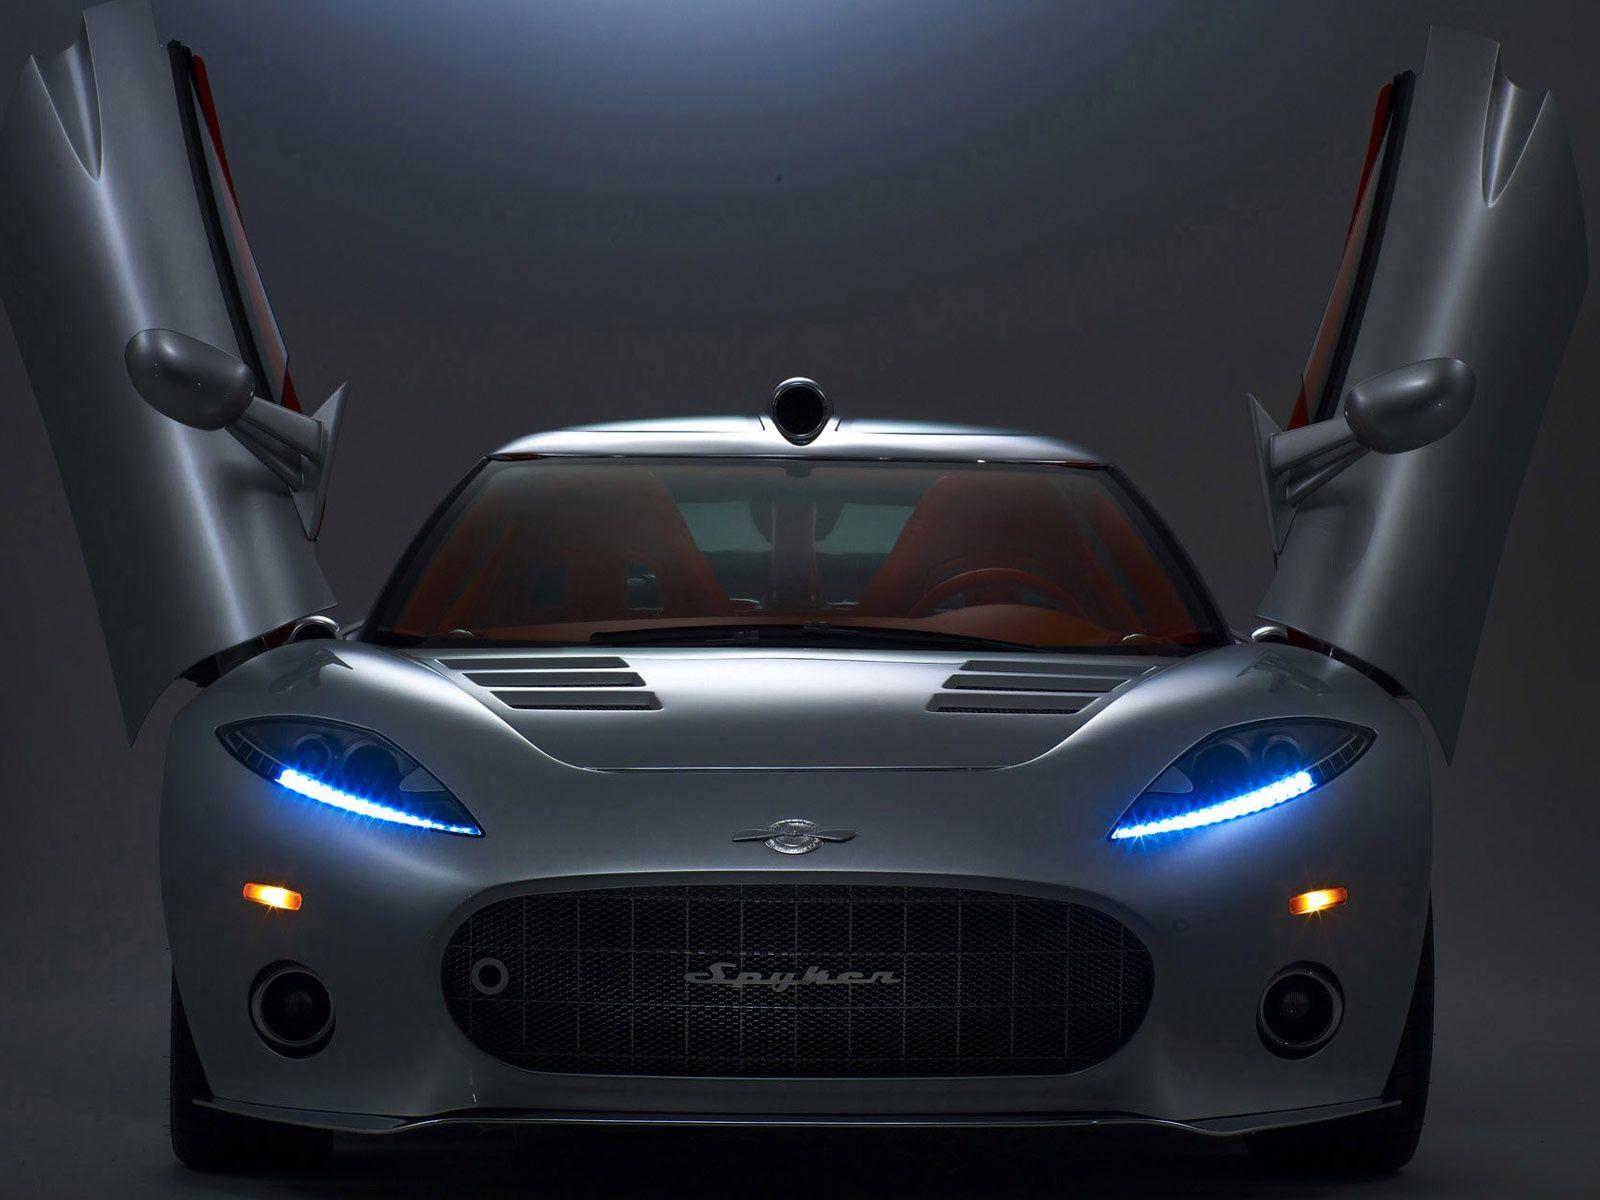 Spyker C8 Aileron Sports cars luxury, Sports cars, New